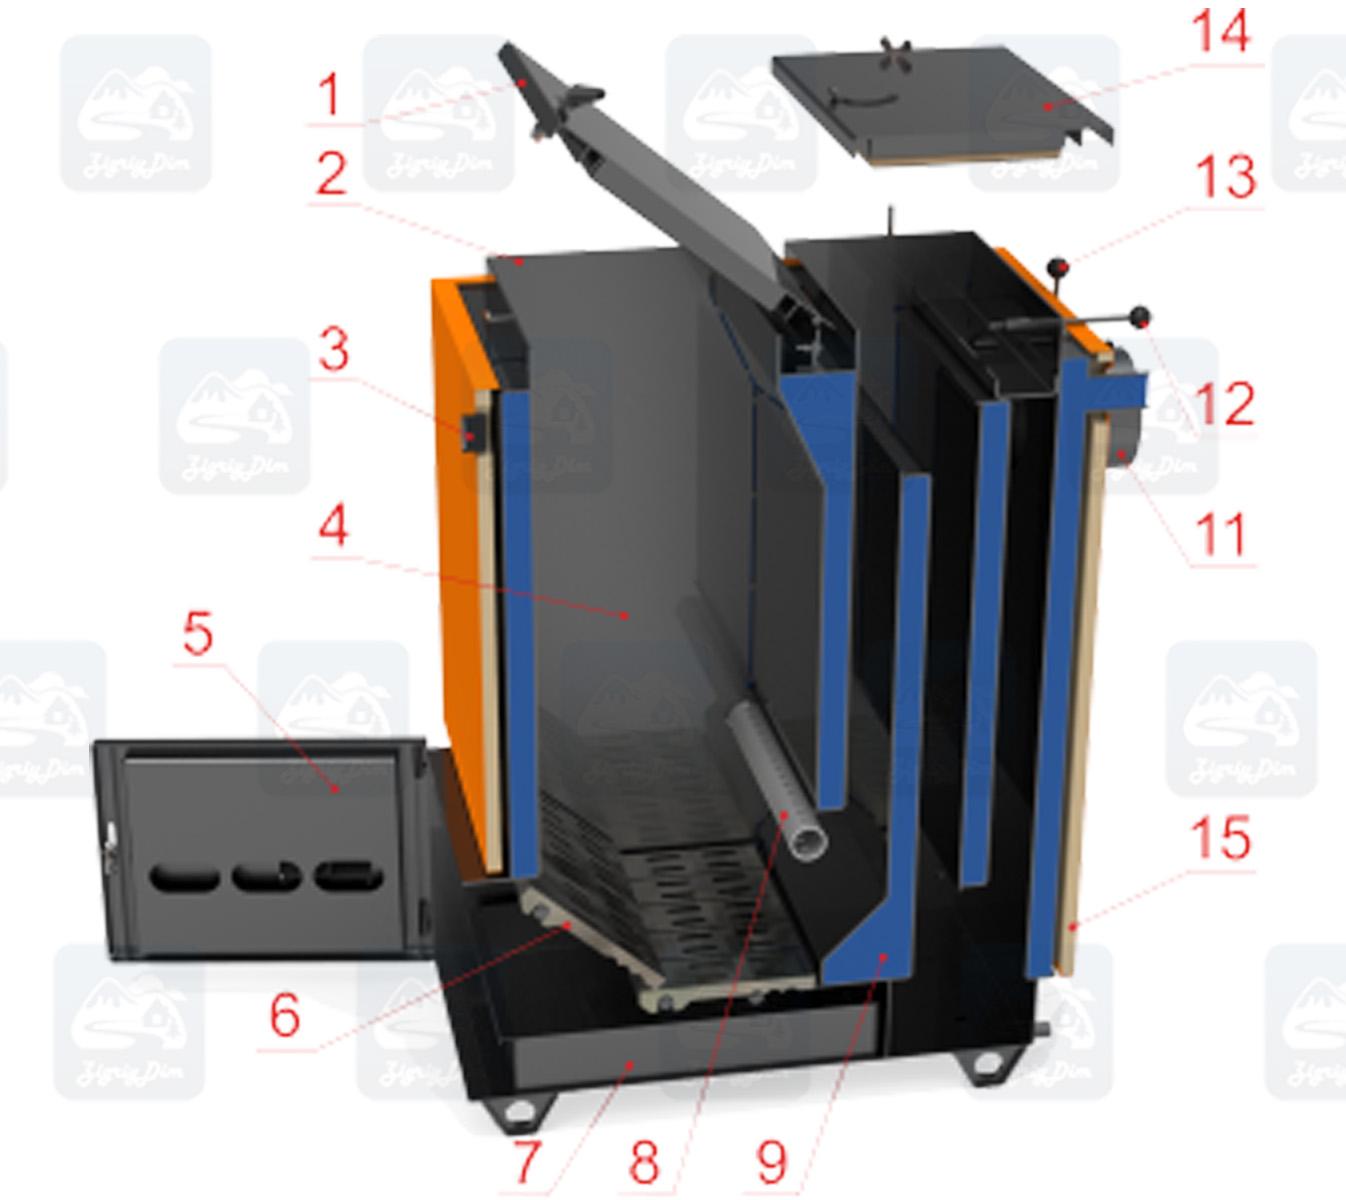 Схема устройства твердотопливного котла Холмова шахтного типа Ретра-6М Комфорт